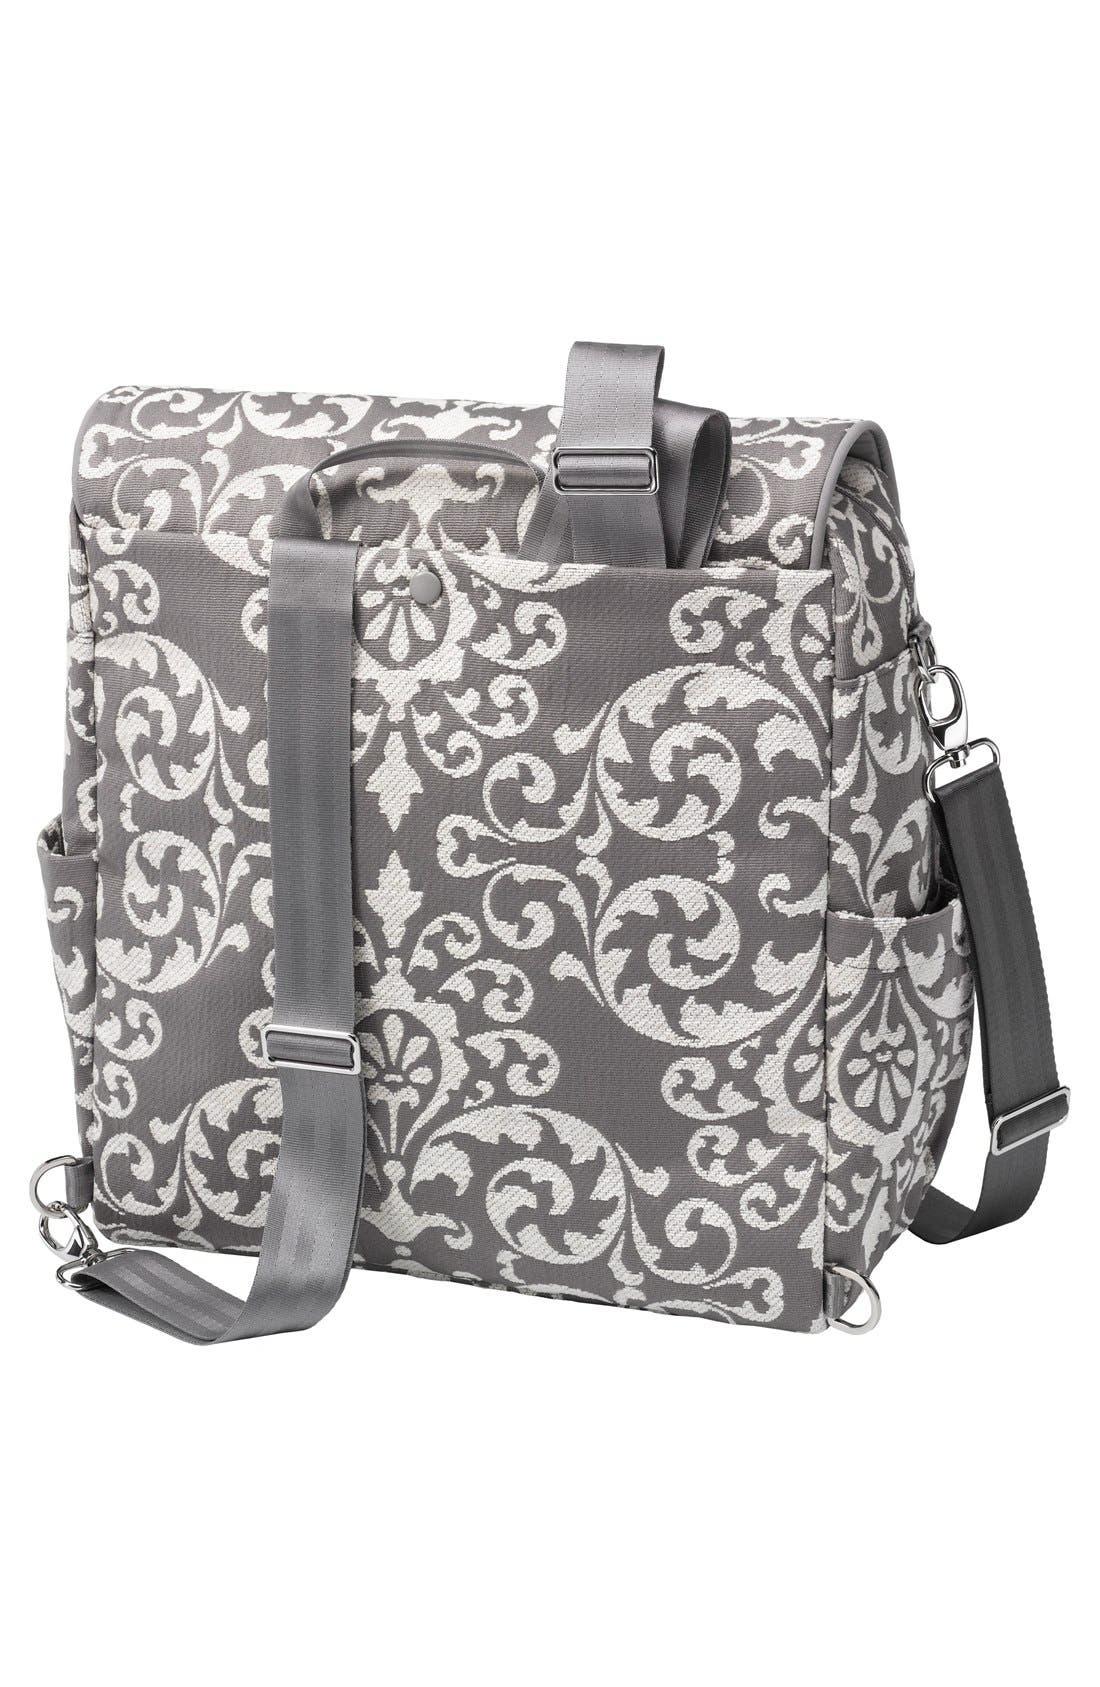 Alternate Image 2  - Petunia Pickle Bottom 'Boxy' Chenille Convertible Diaper Backpack